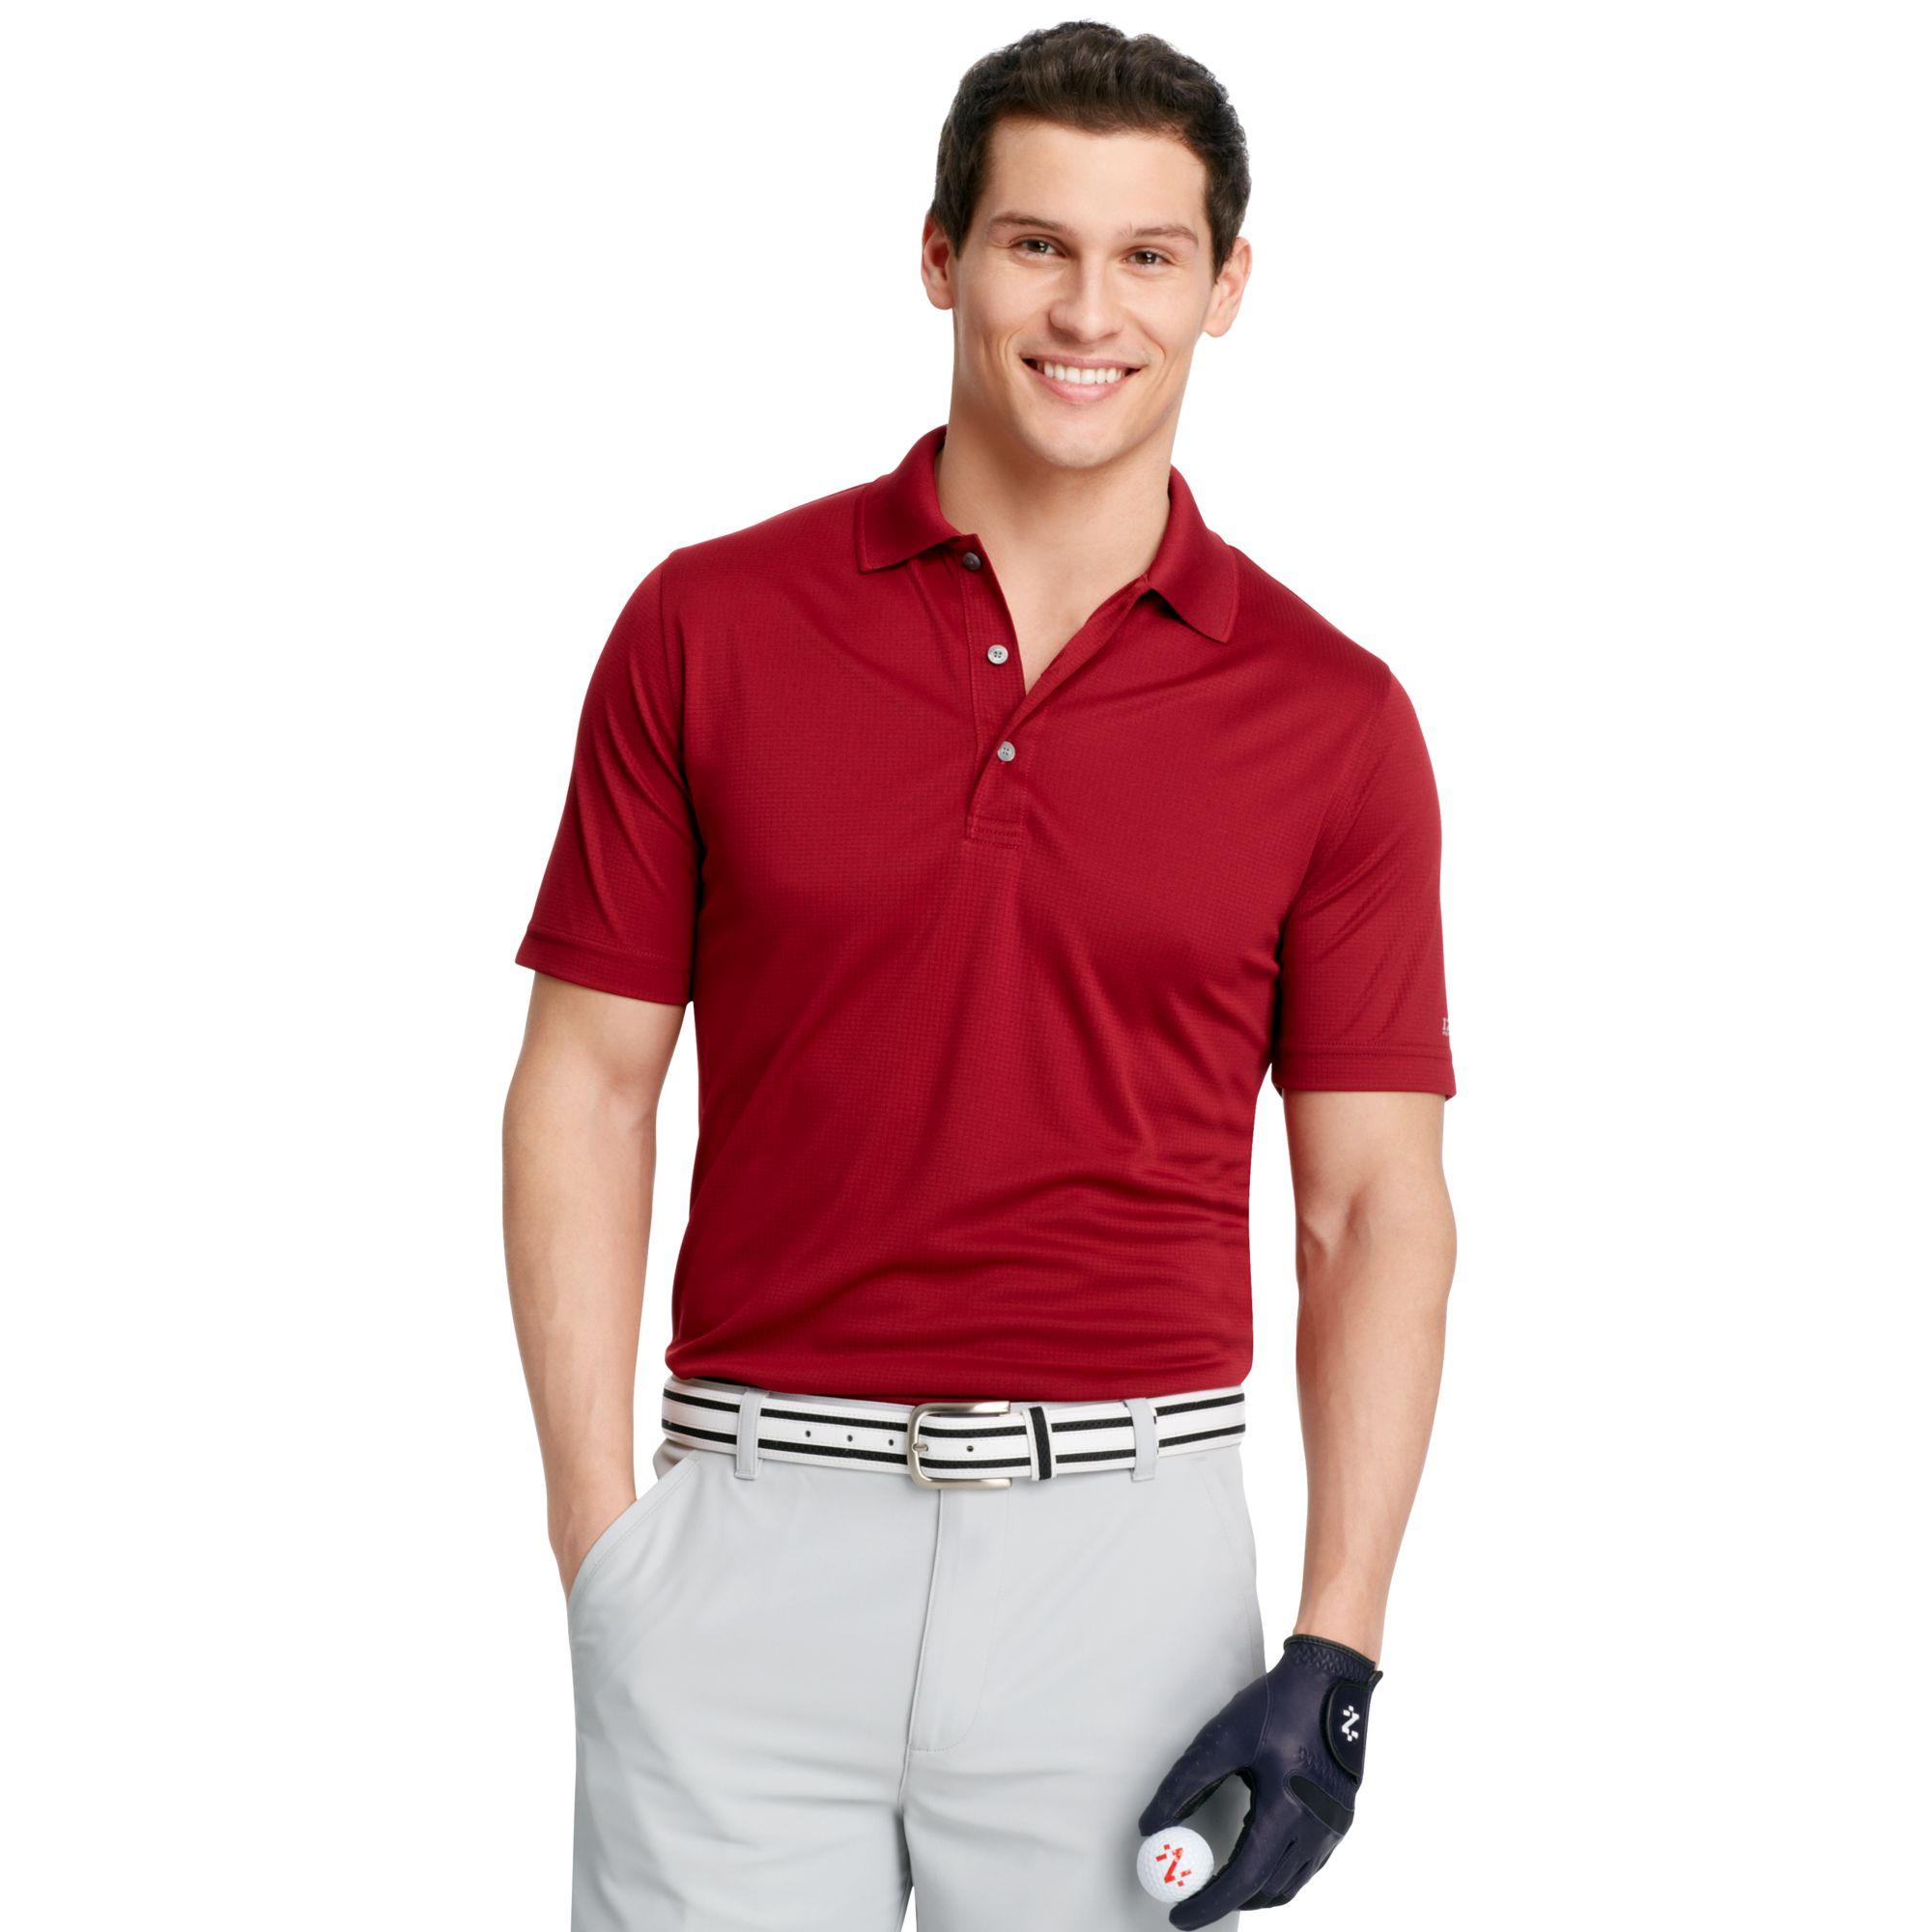 Izod izod big and tall shirt shortsleeve solid performance for Izod big and tall shirts